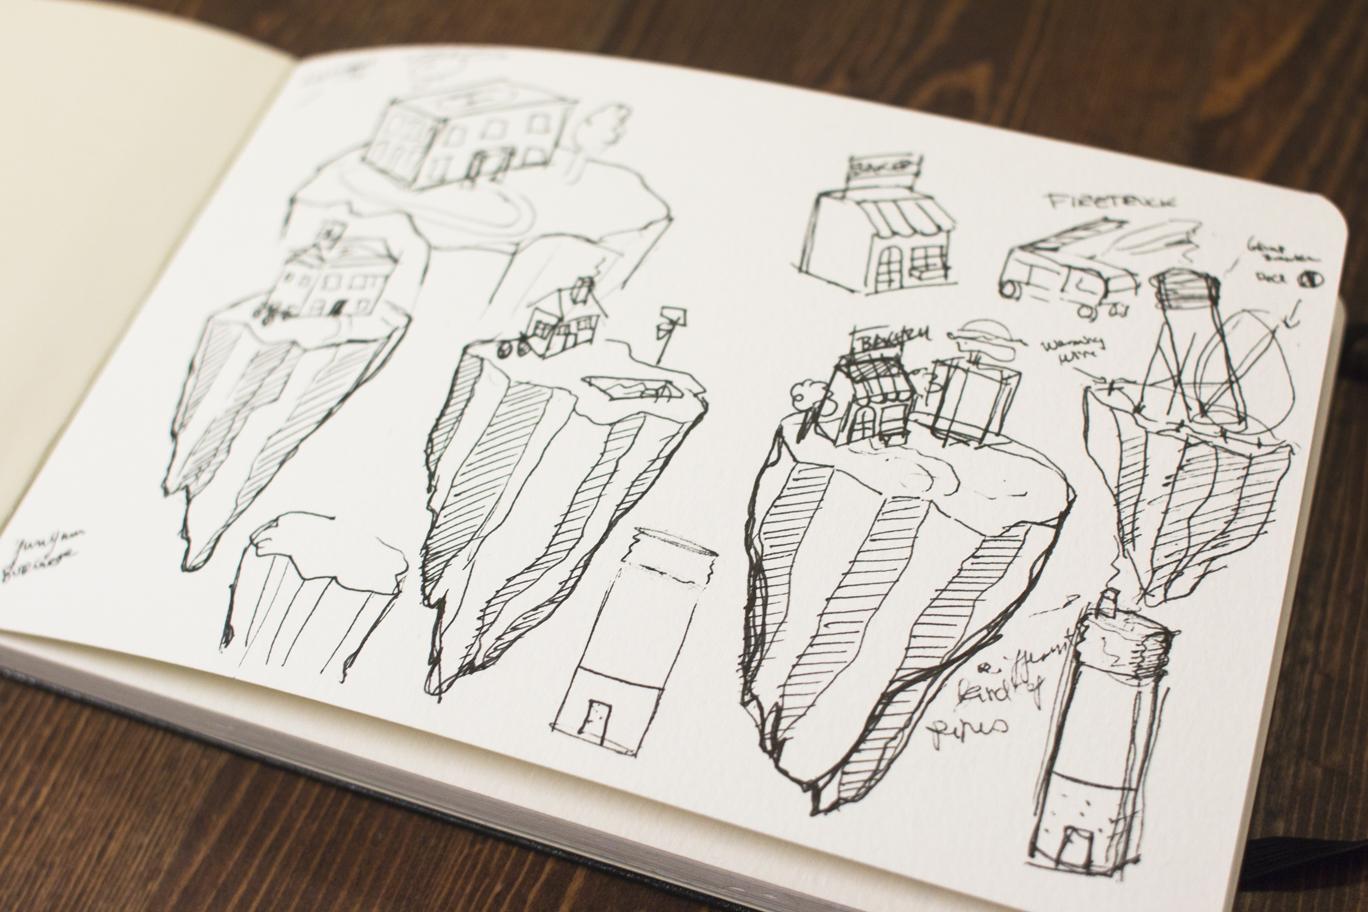 nuna+sketches_1_25%.jpg